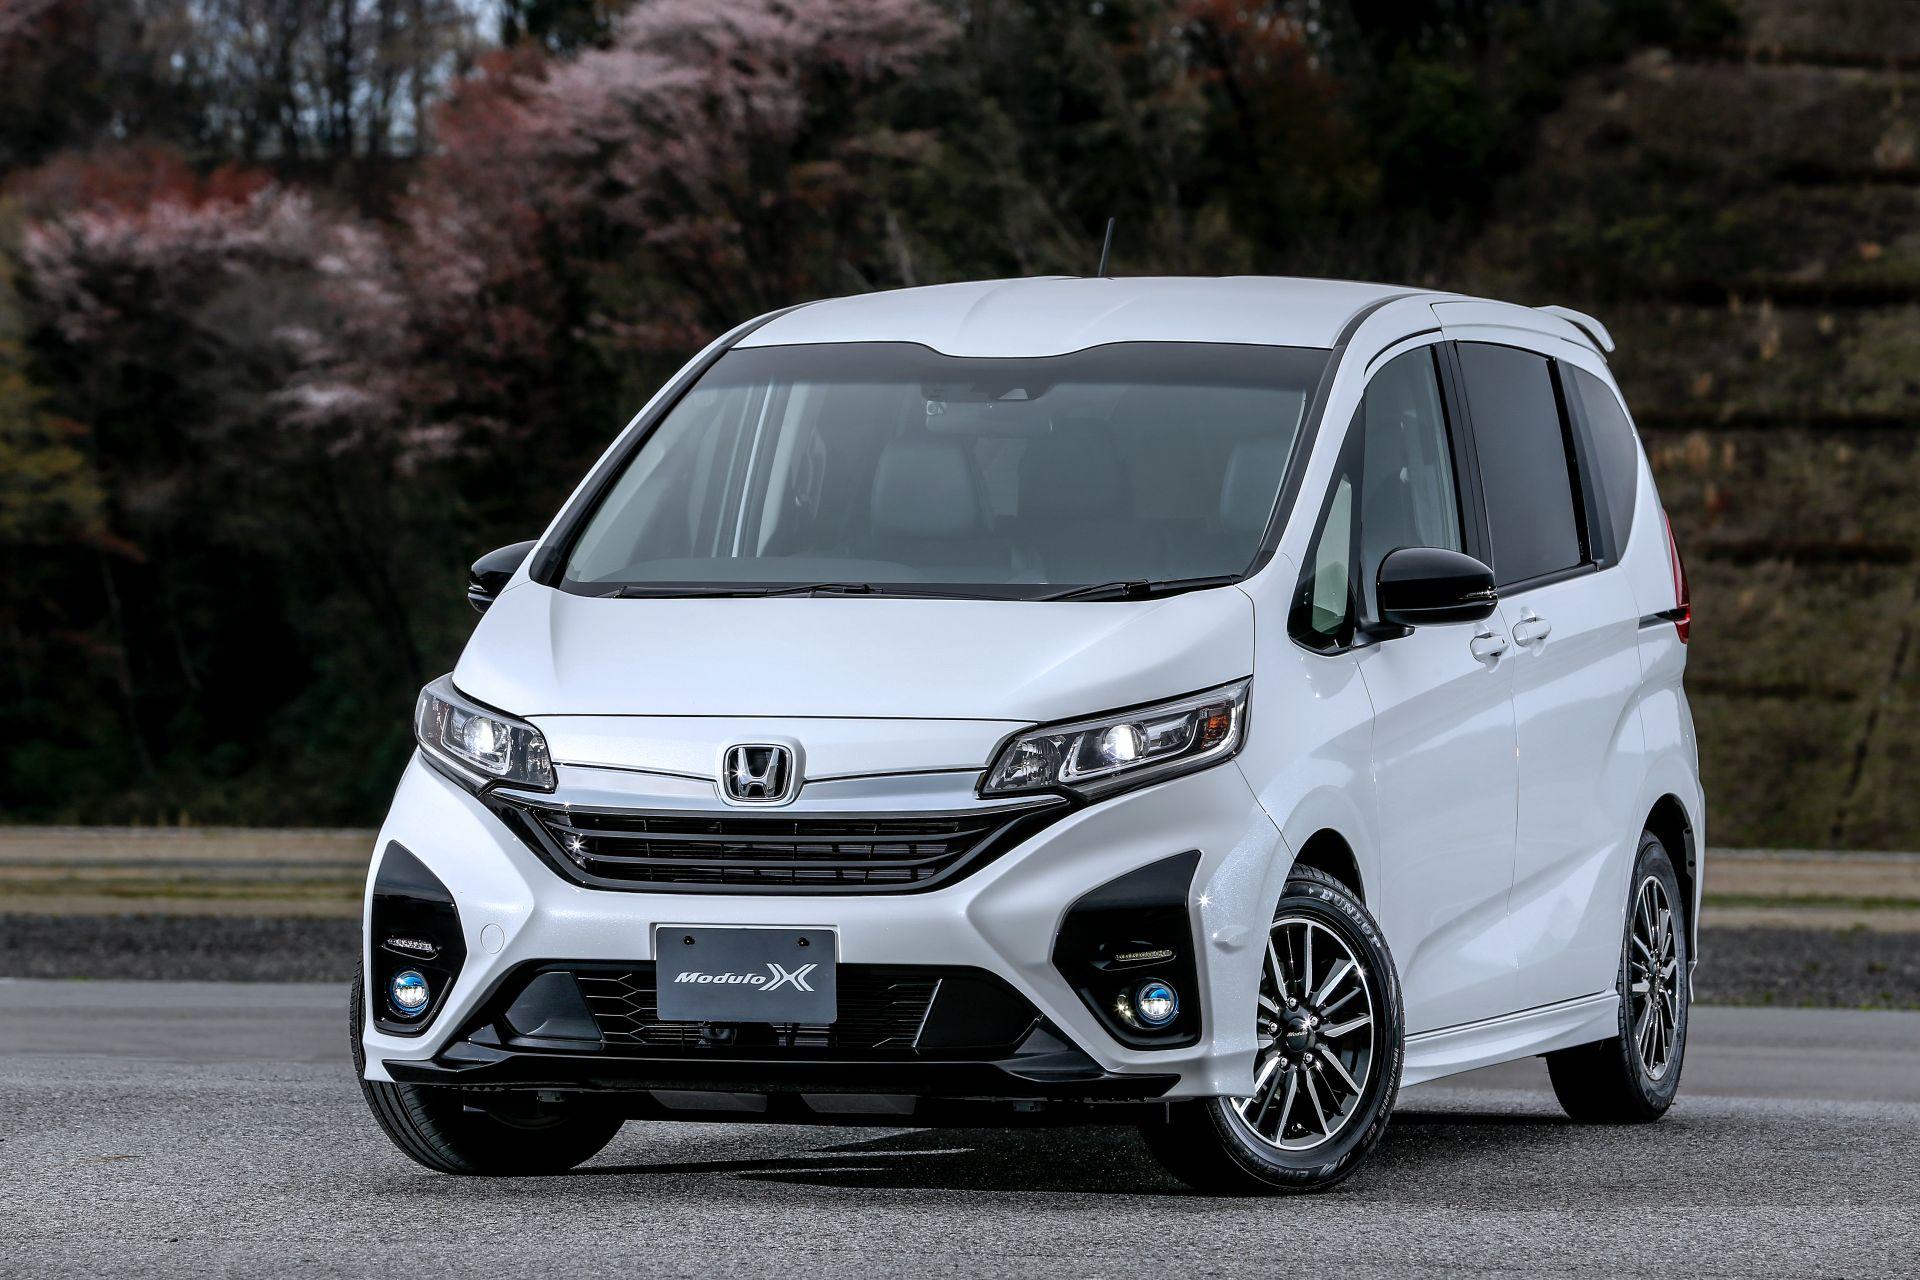 Honda-Freed-Modulo-X-Facelift-2020-3